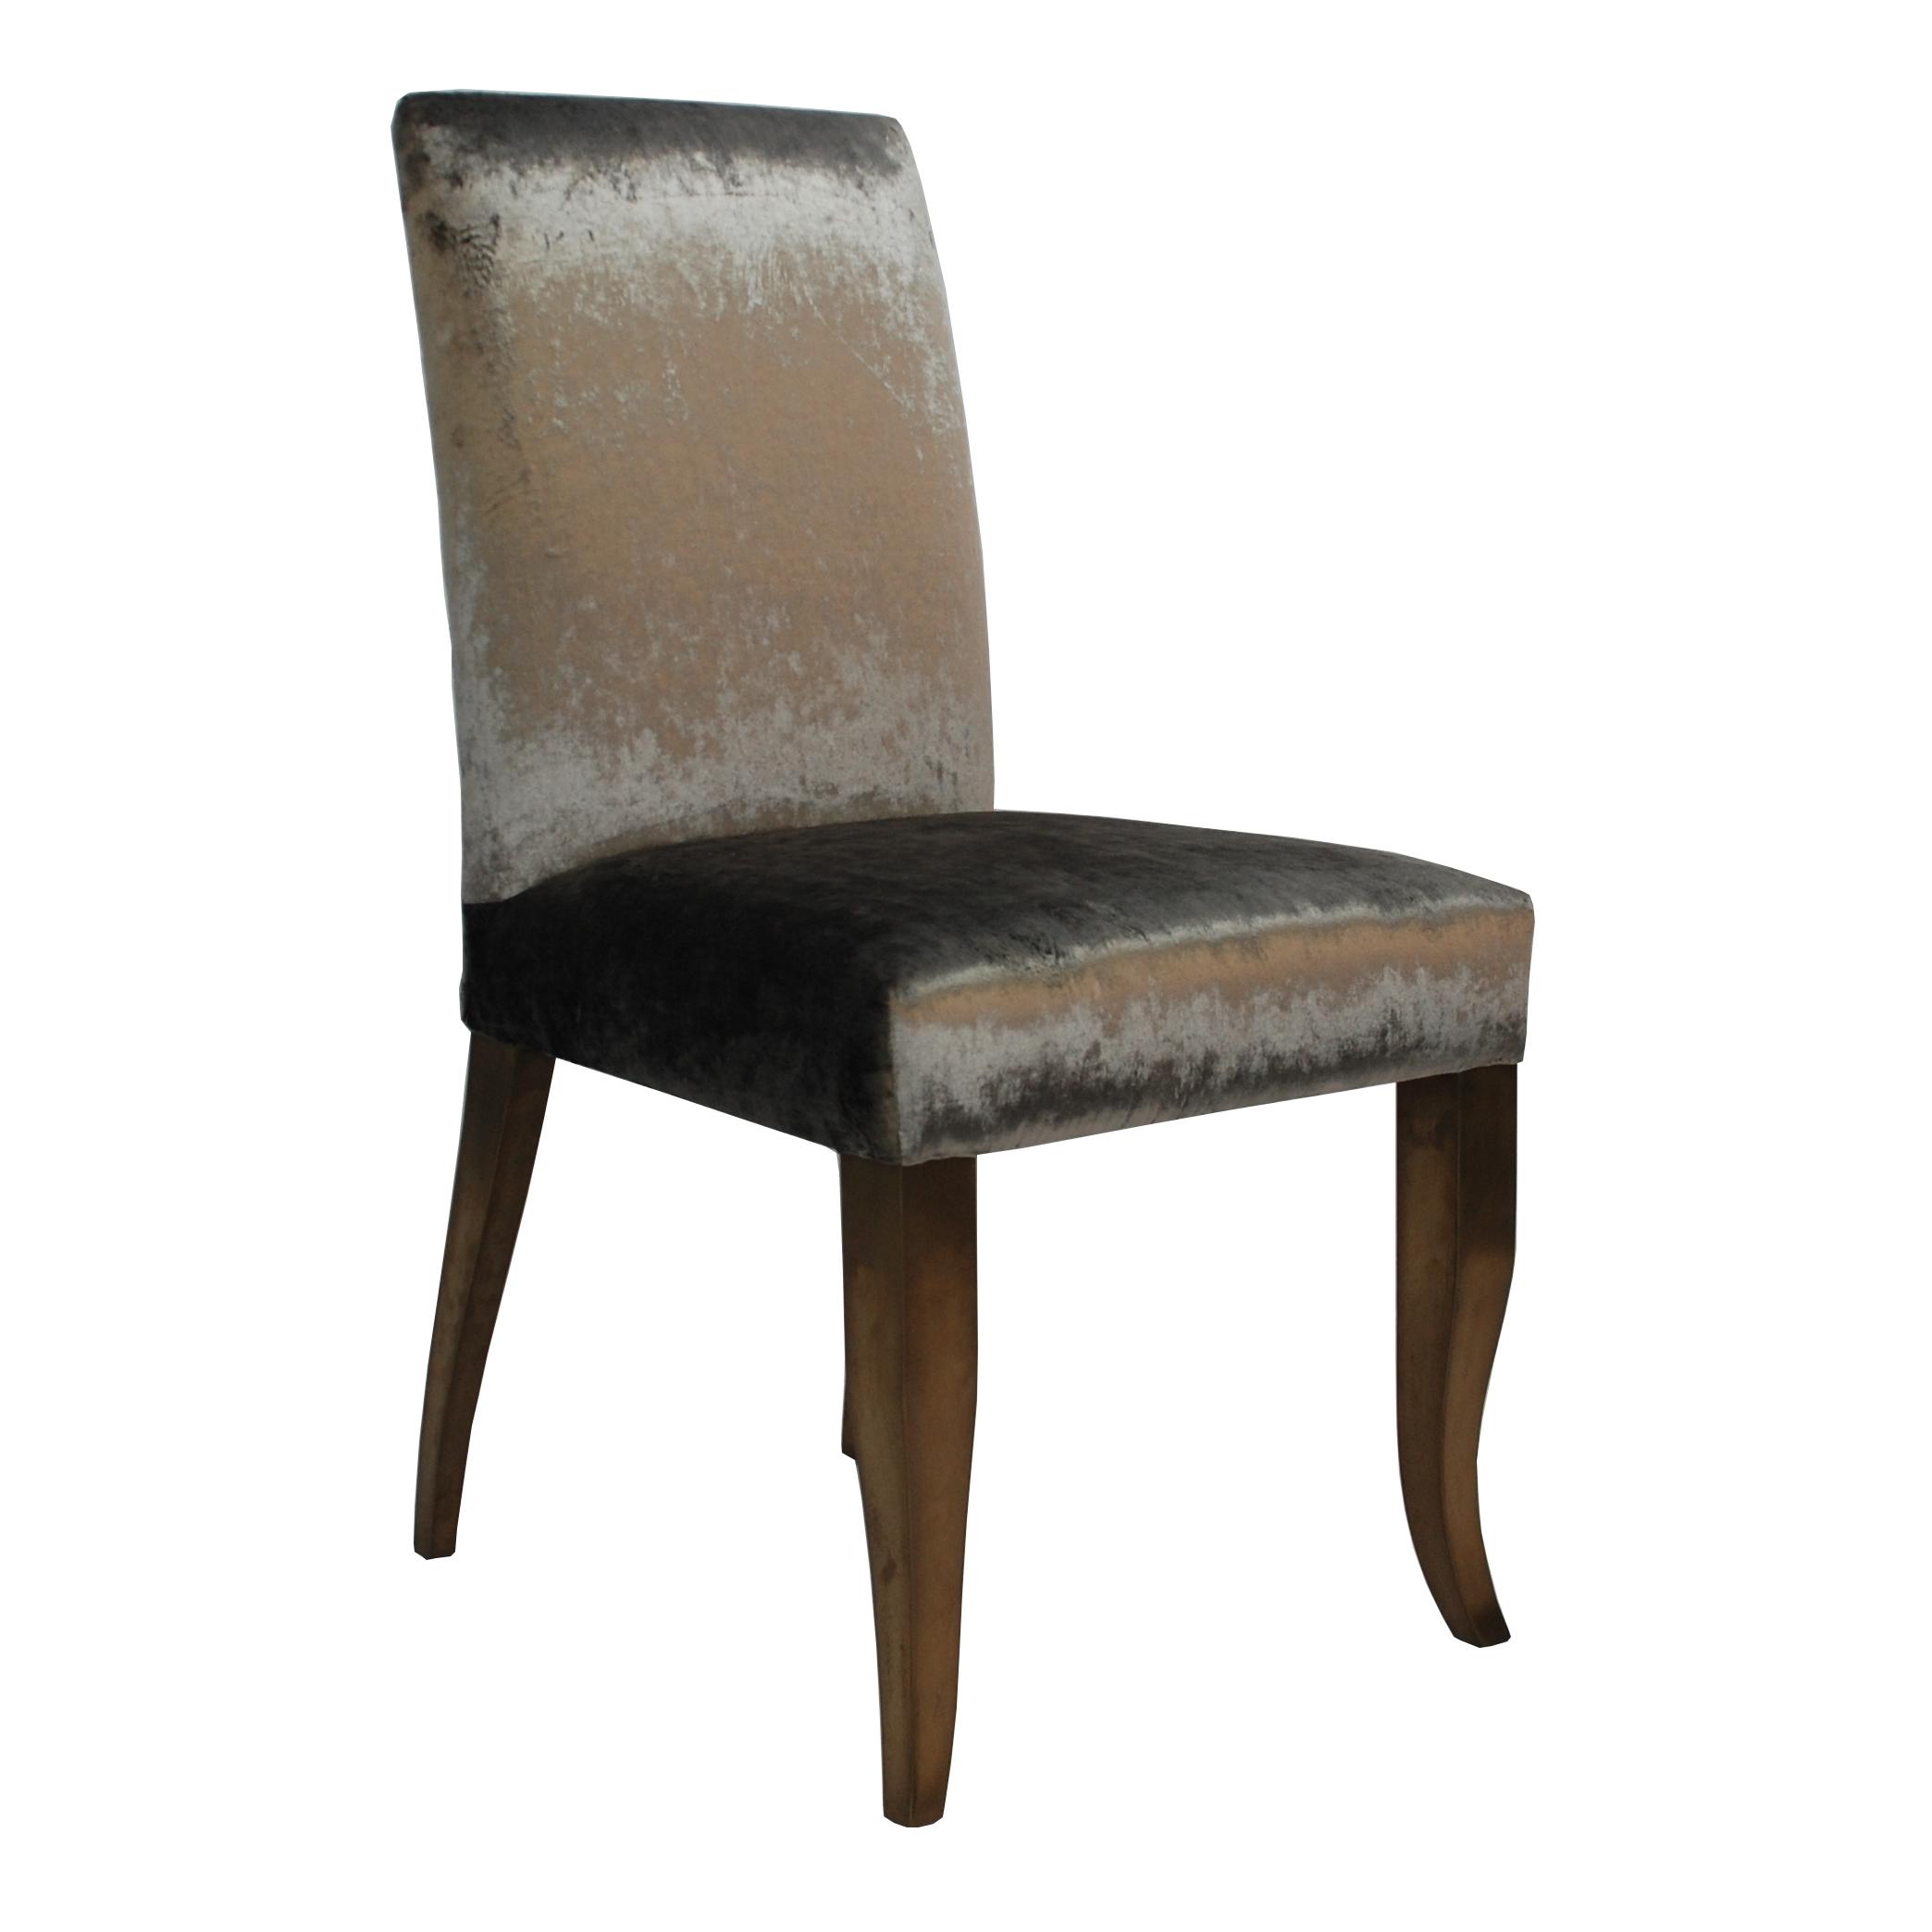 Ansty dining chair plain back Handmade in UK Chairmaker : Ansty Dining Chair from www.chairmaker.co.uk size 2088 x 2088 jpeg 478kB